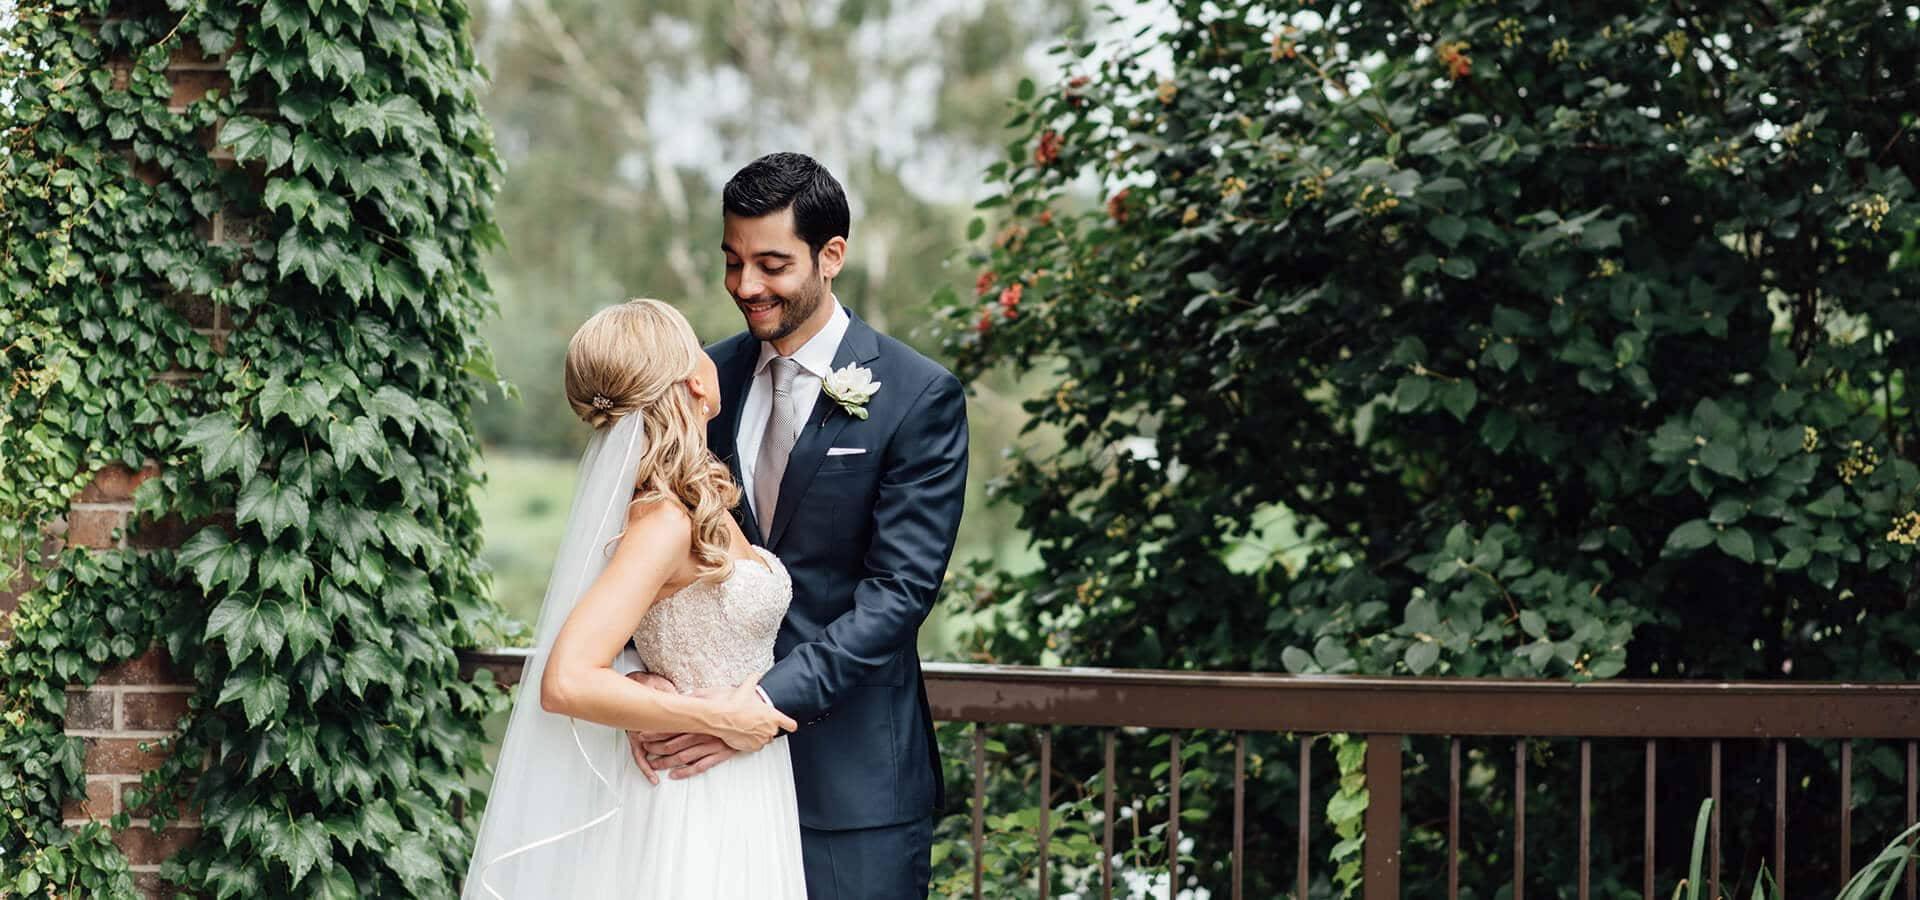 Hero image for Kasia and Kiarash's Romantic Wedding at The Manor